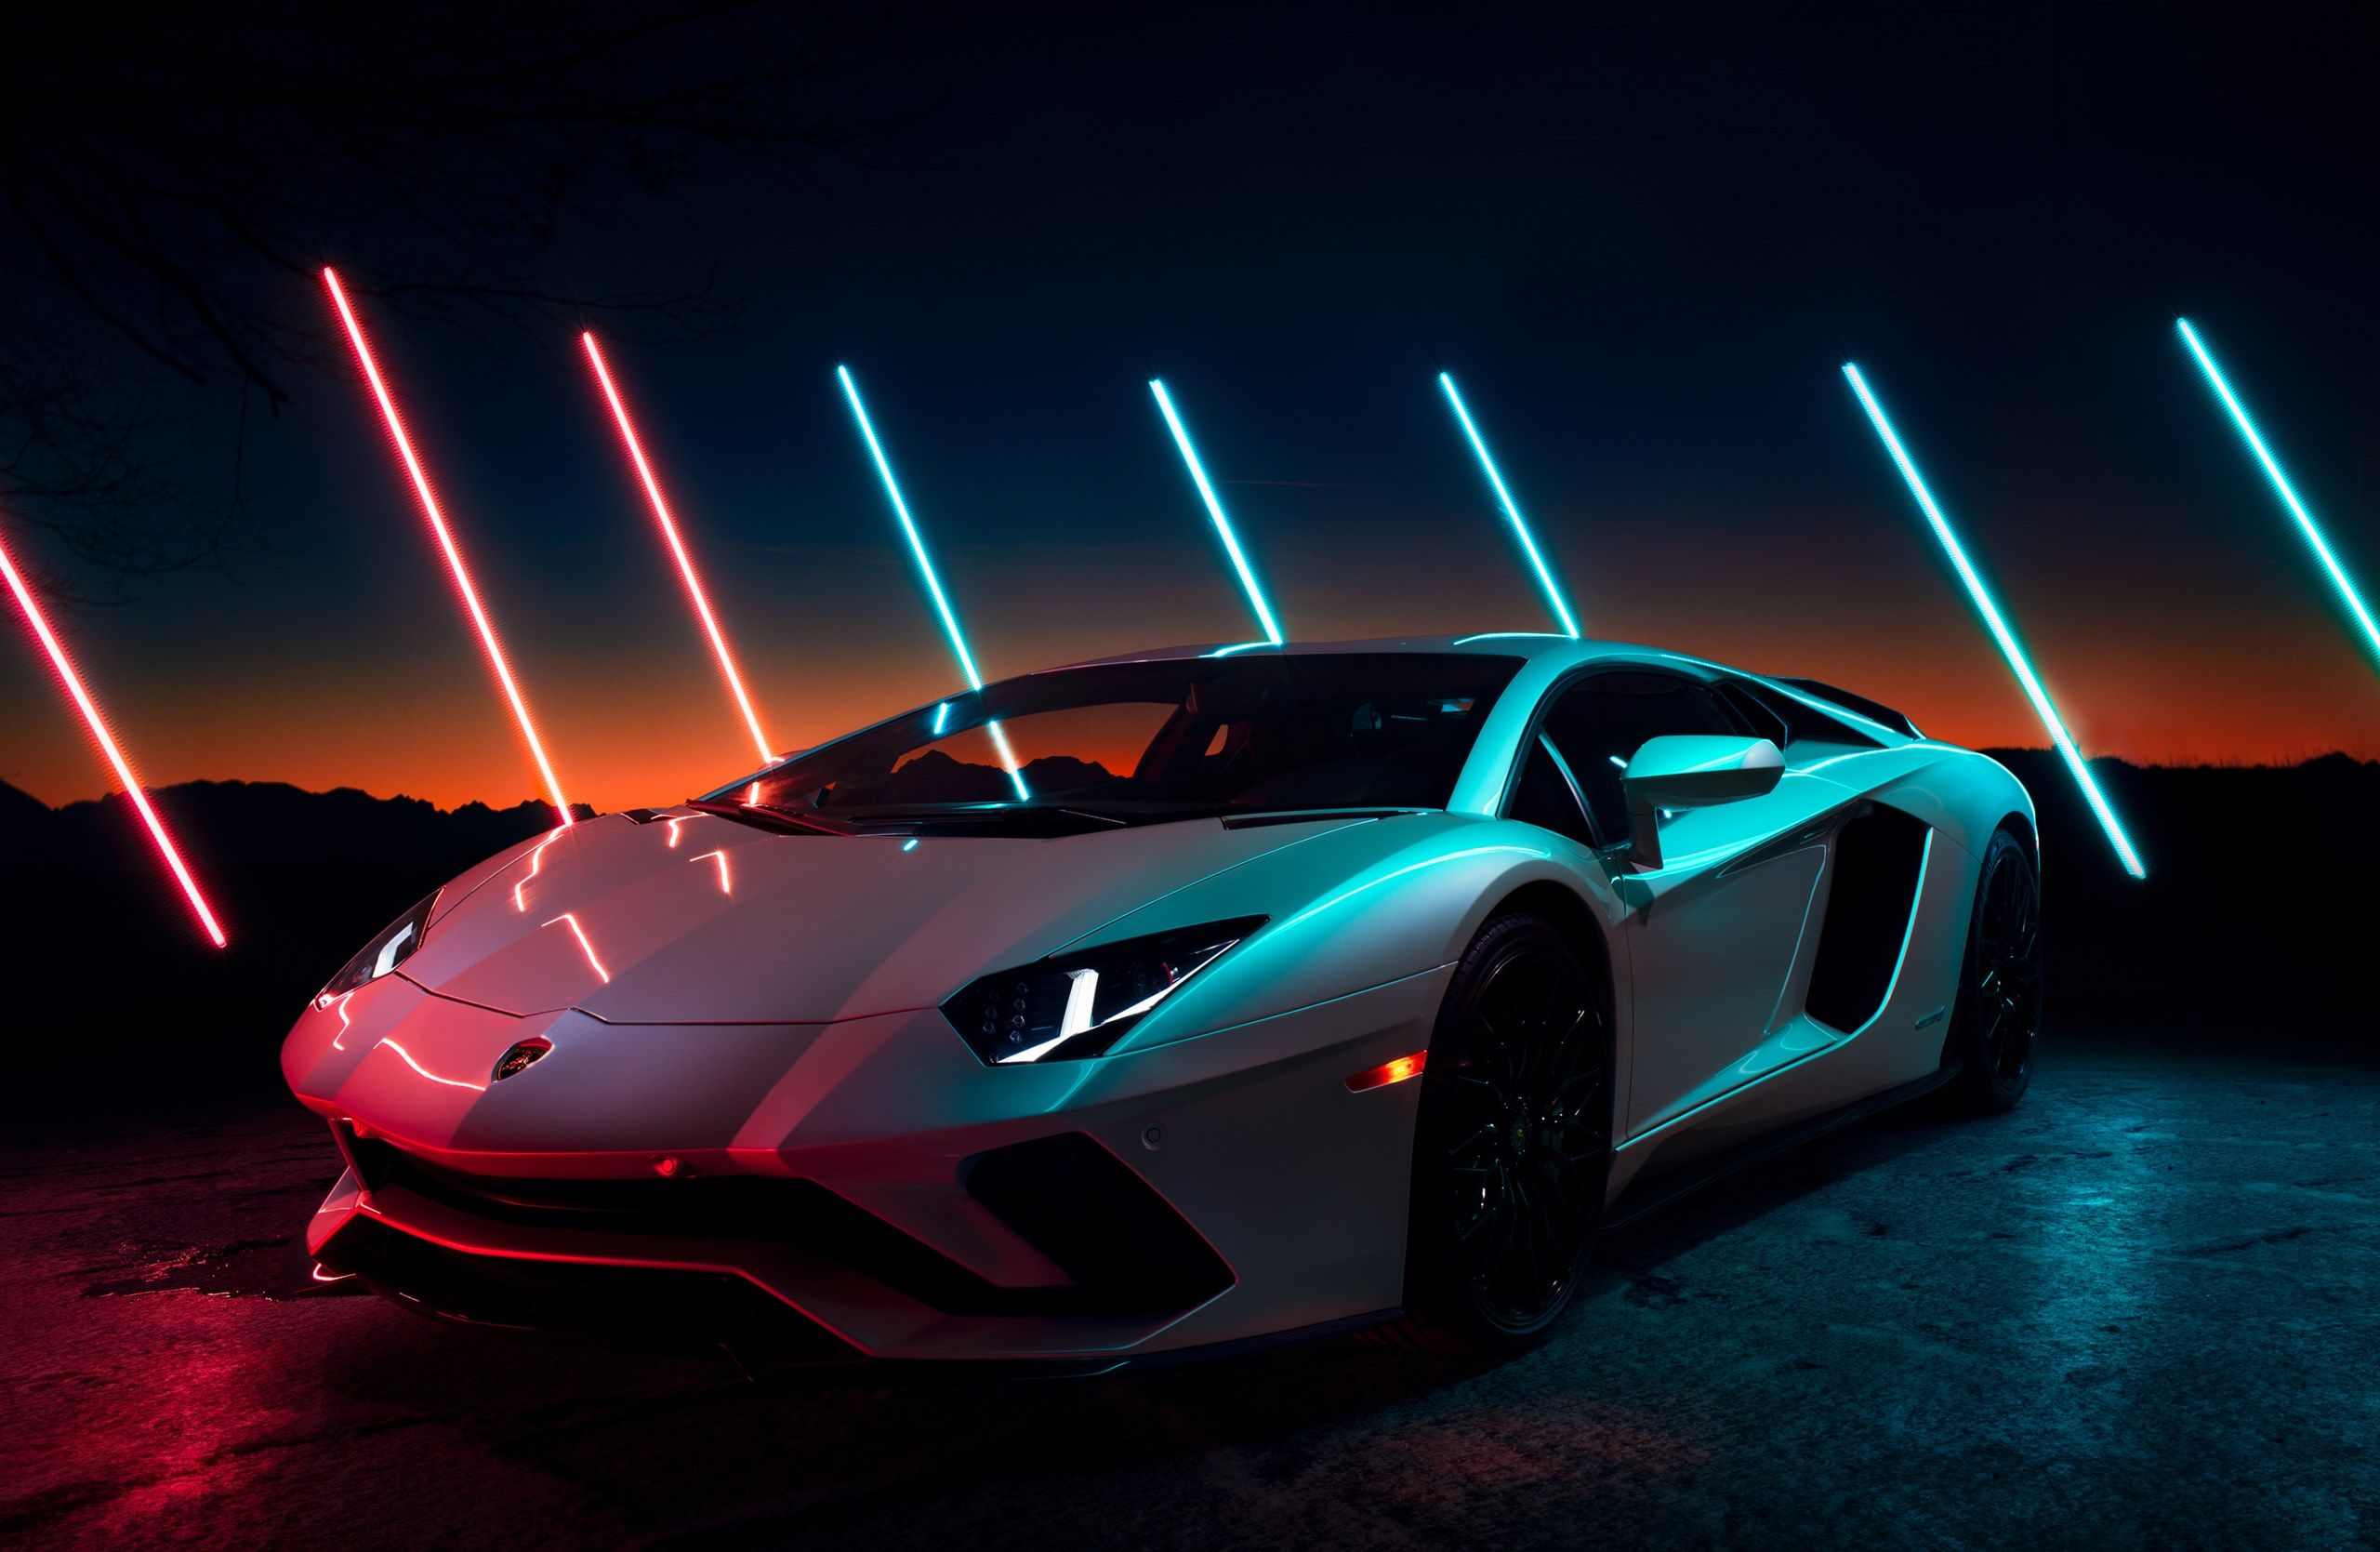 Lamborghini Aventador S Tillman Light Drawing Dream Cars Bmw Luxury Cars Top Luxury Cars